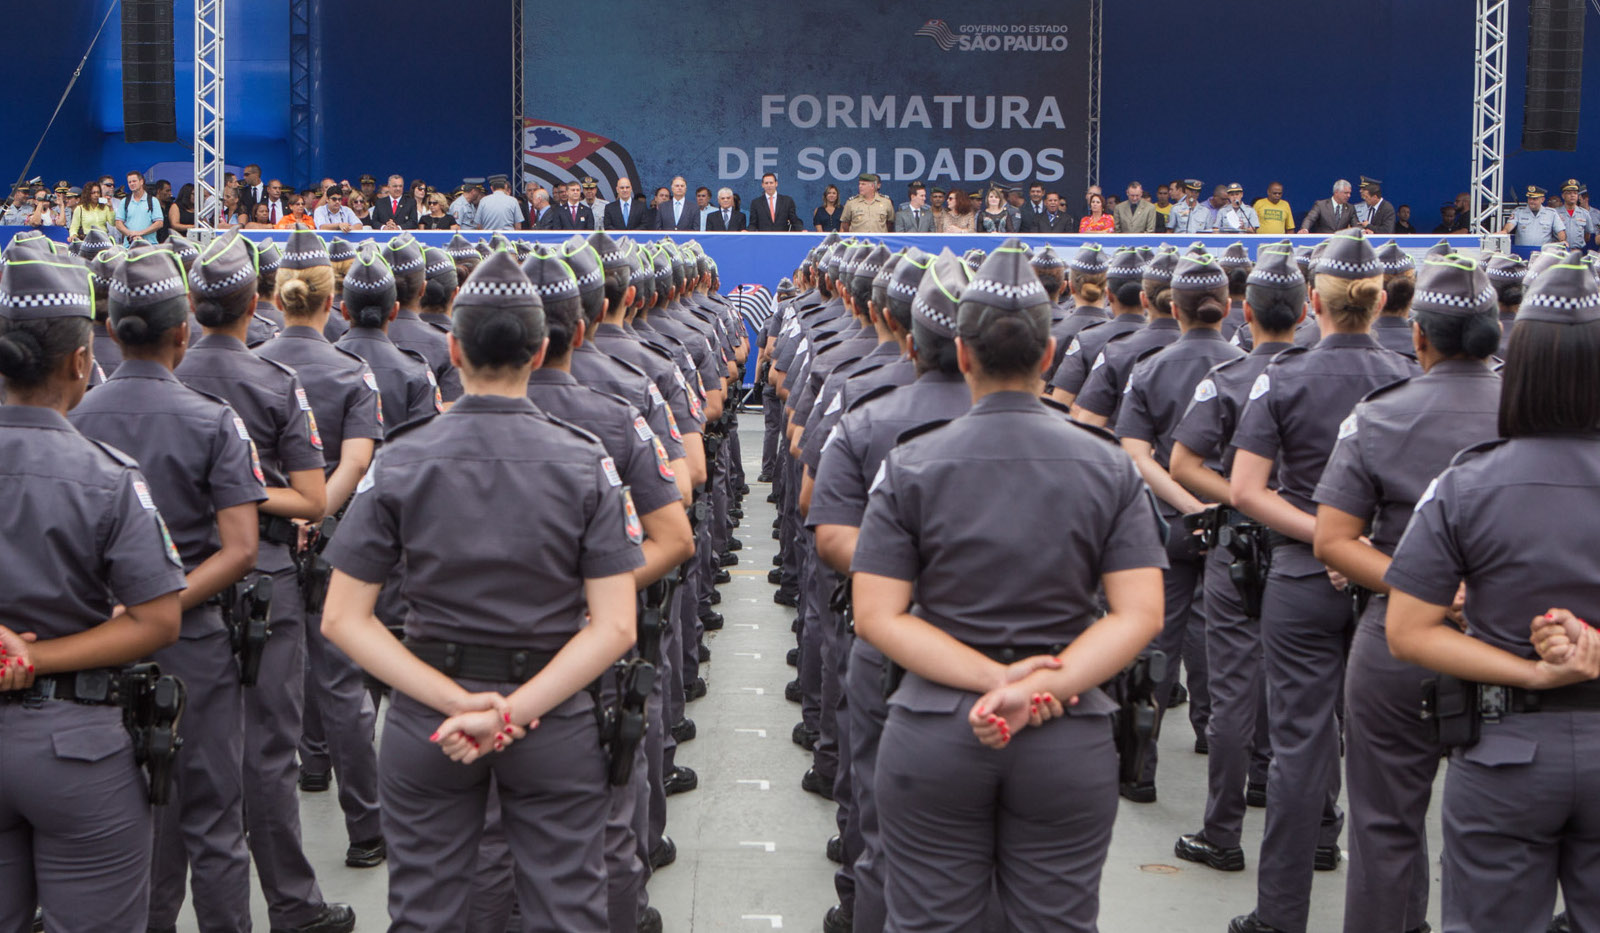 Encoxada na policial militar